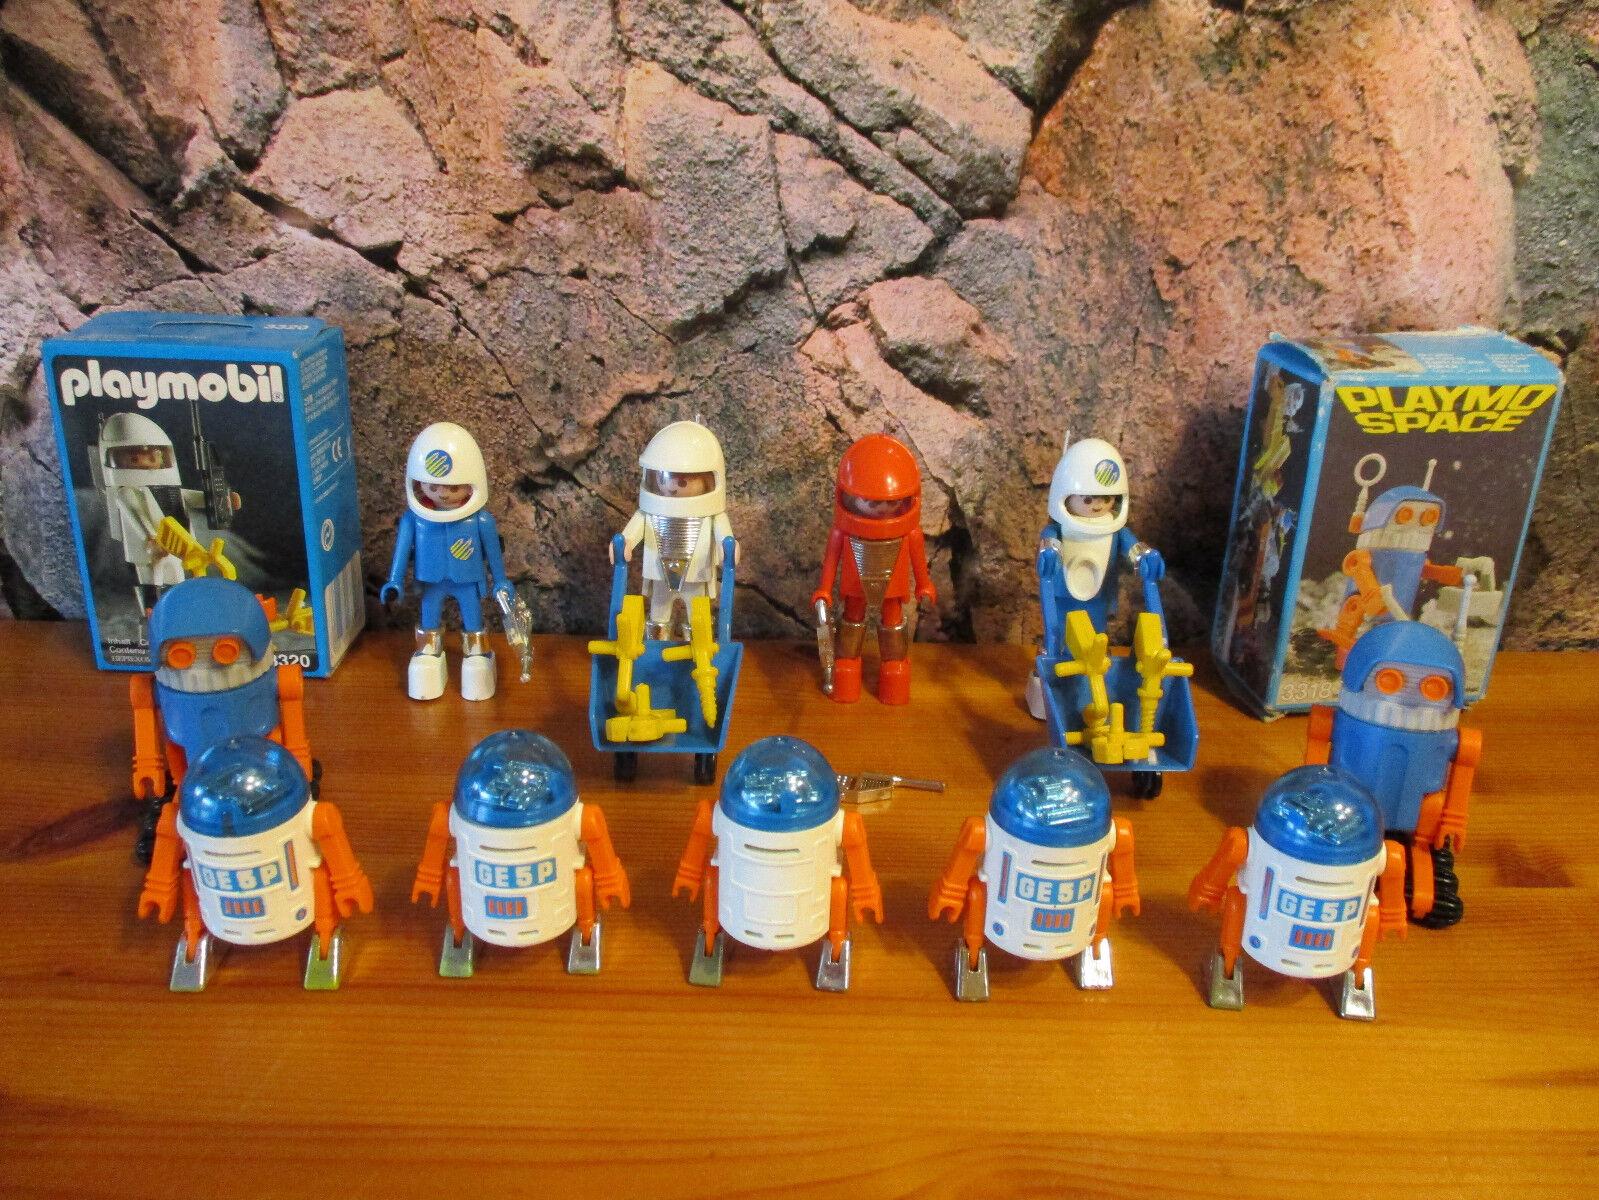 ( C11 ) 3320 3318 3591 3589 3590 Space Weltraum Weltall Roboter Astronauten